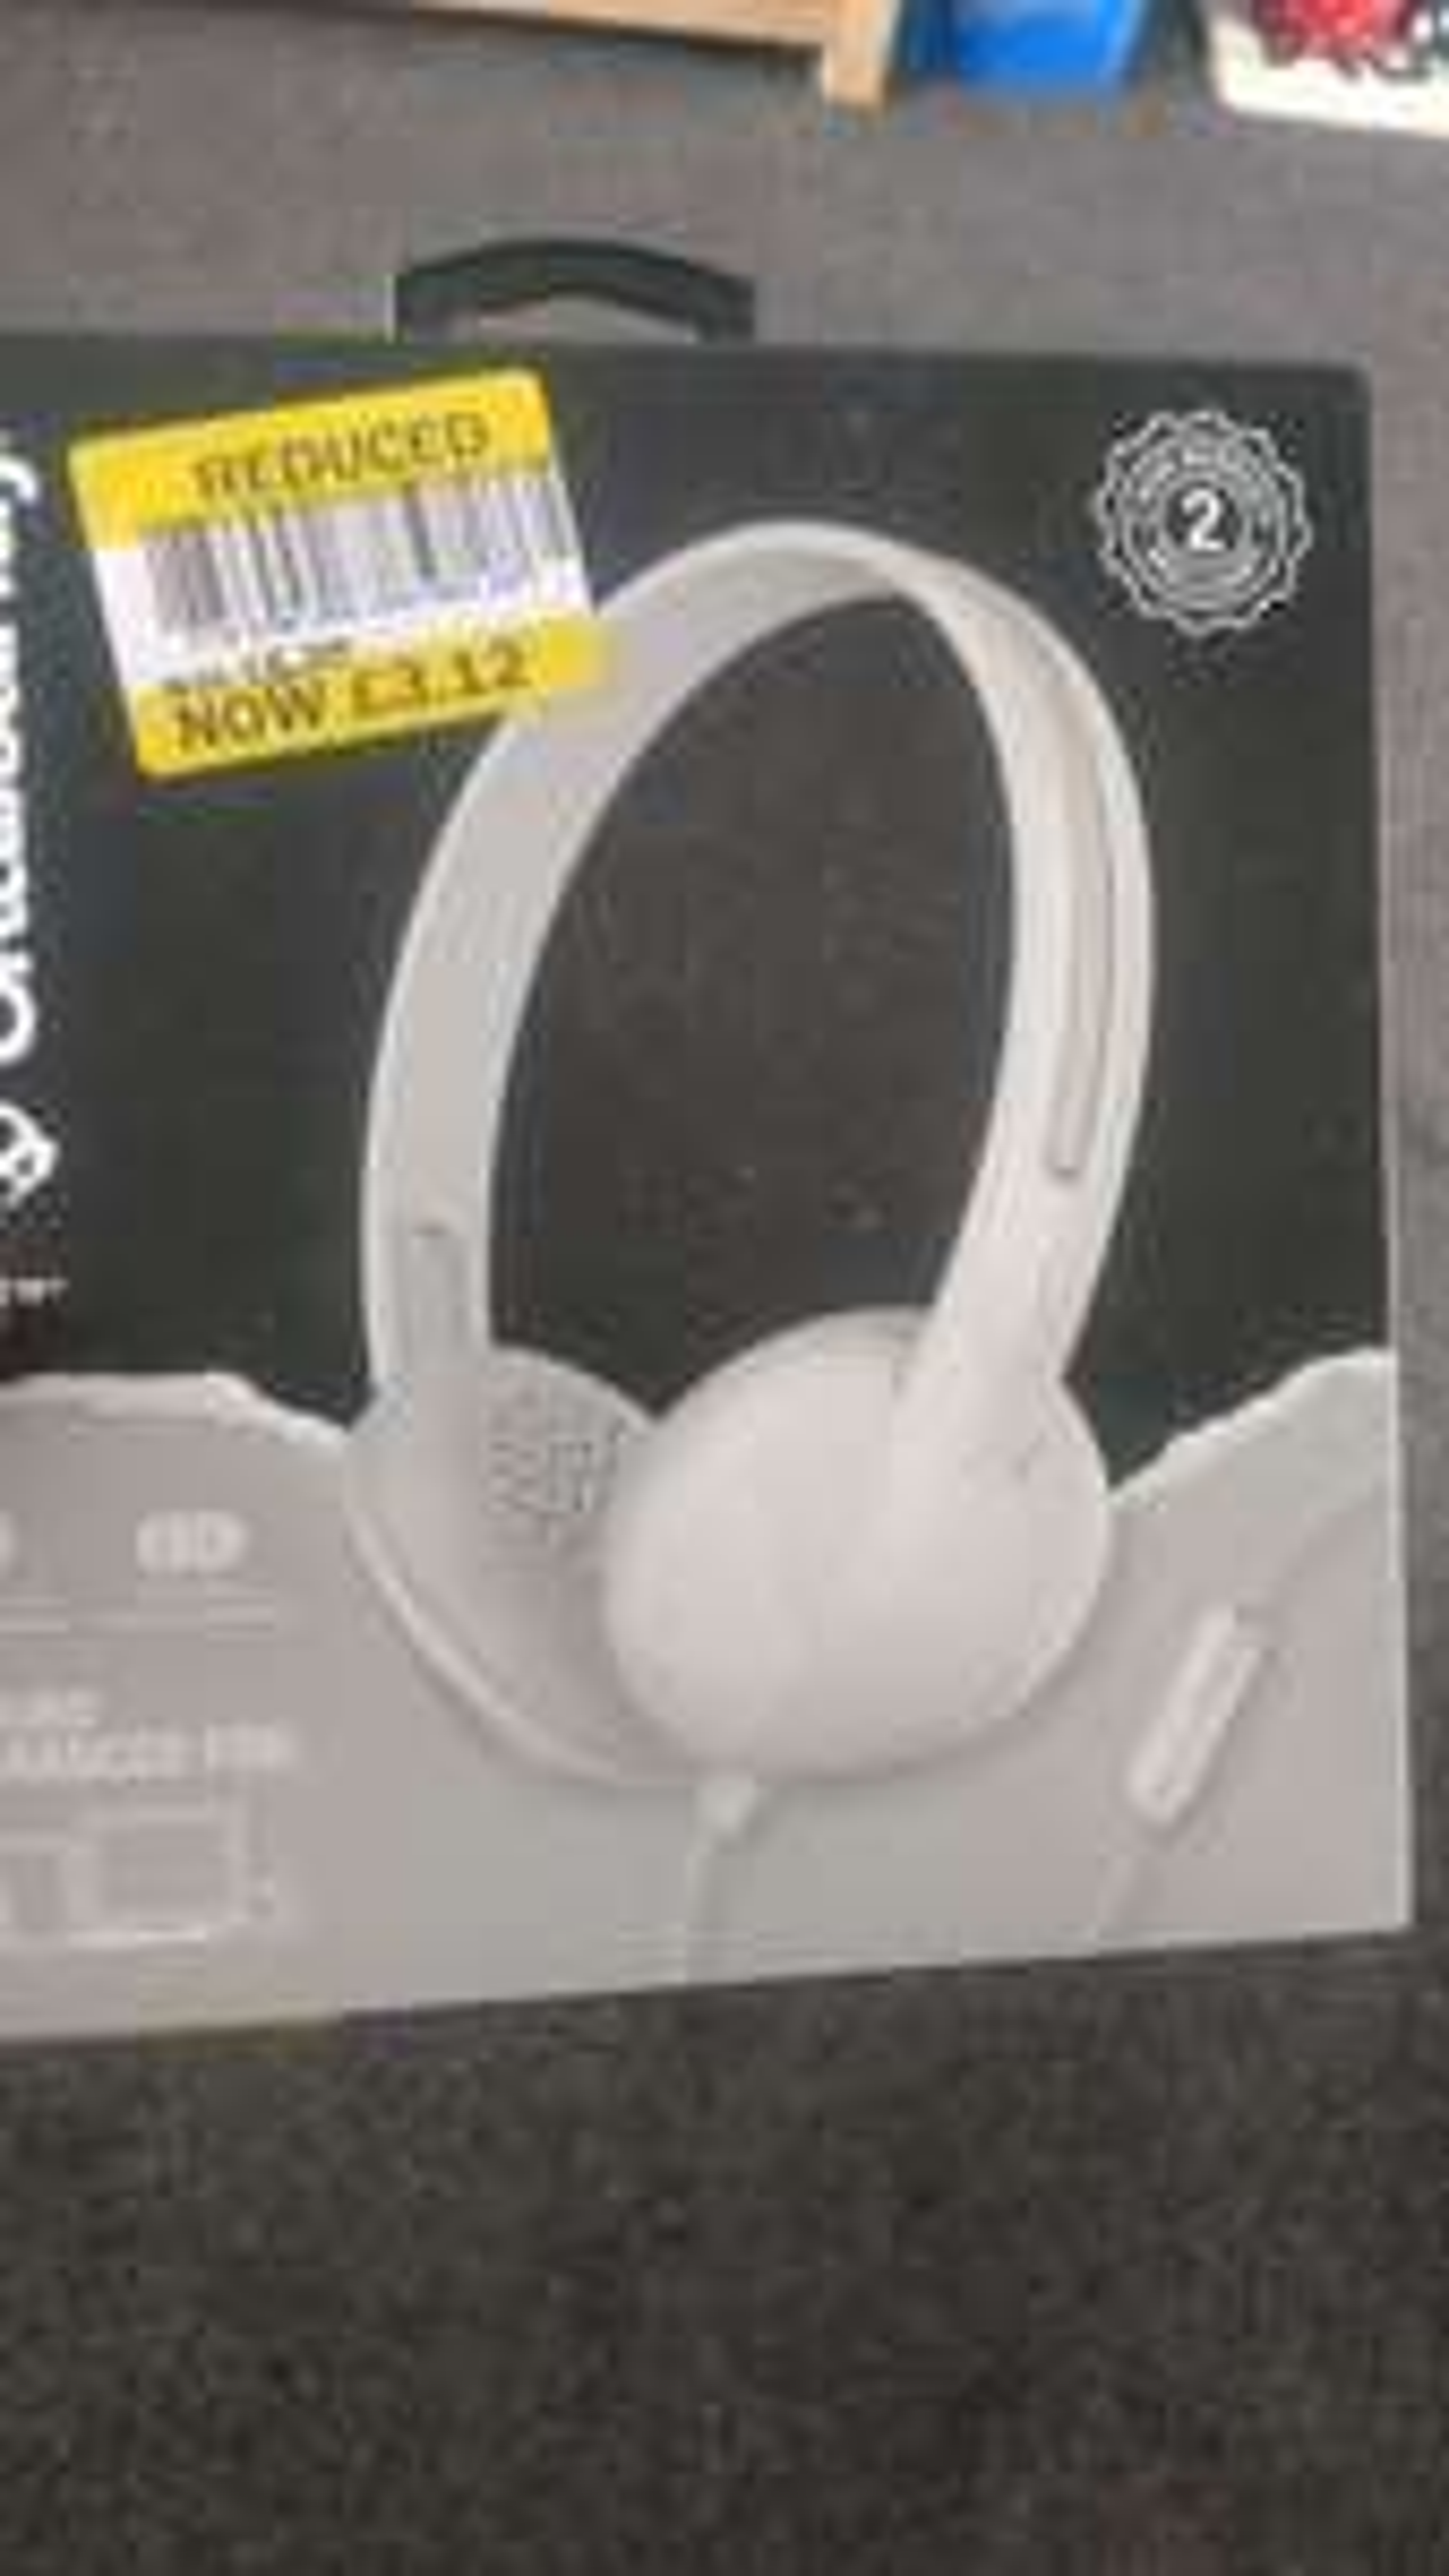 Skullcandy Stim Headphones £3.12 instore @ Tesco Brislington